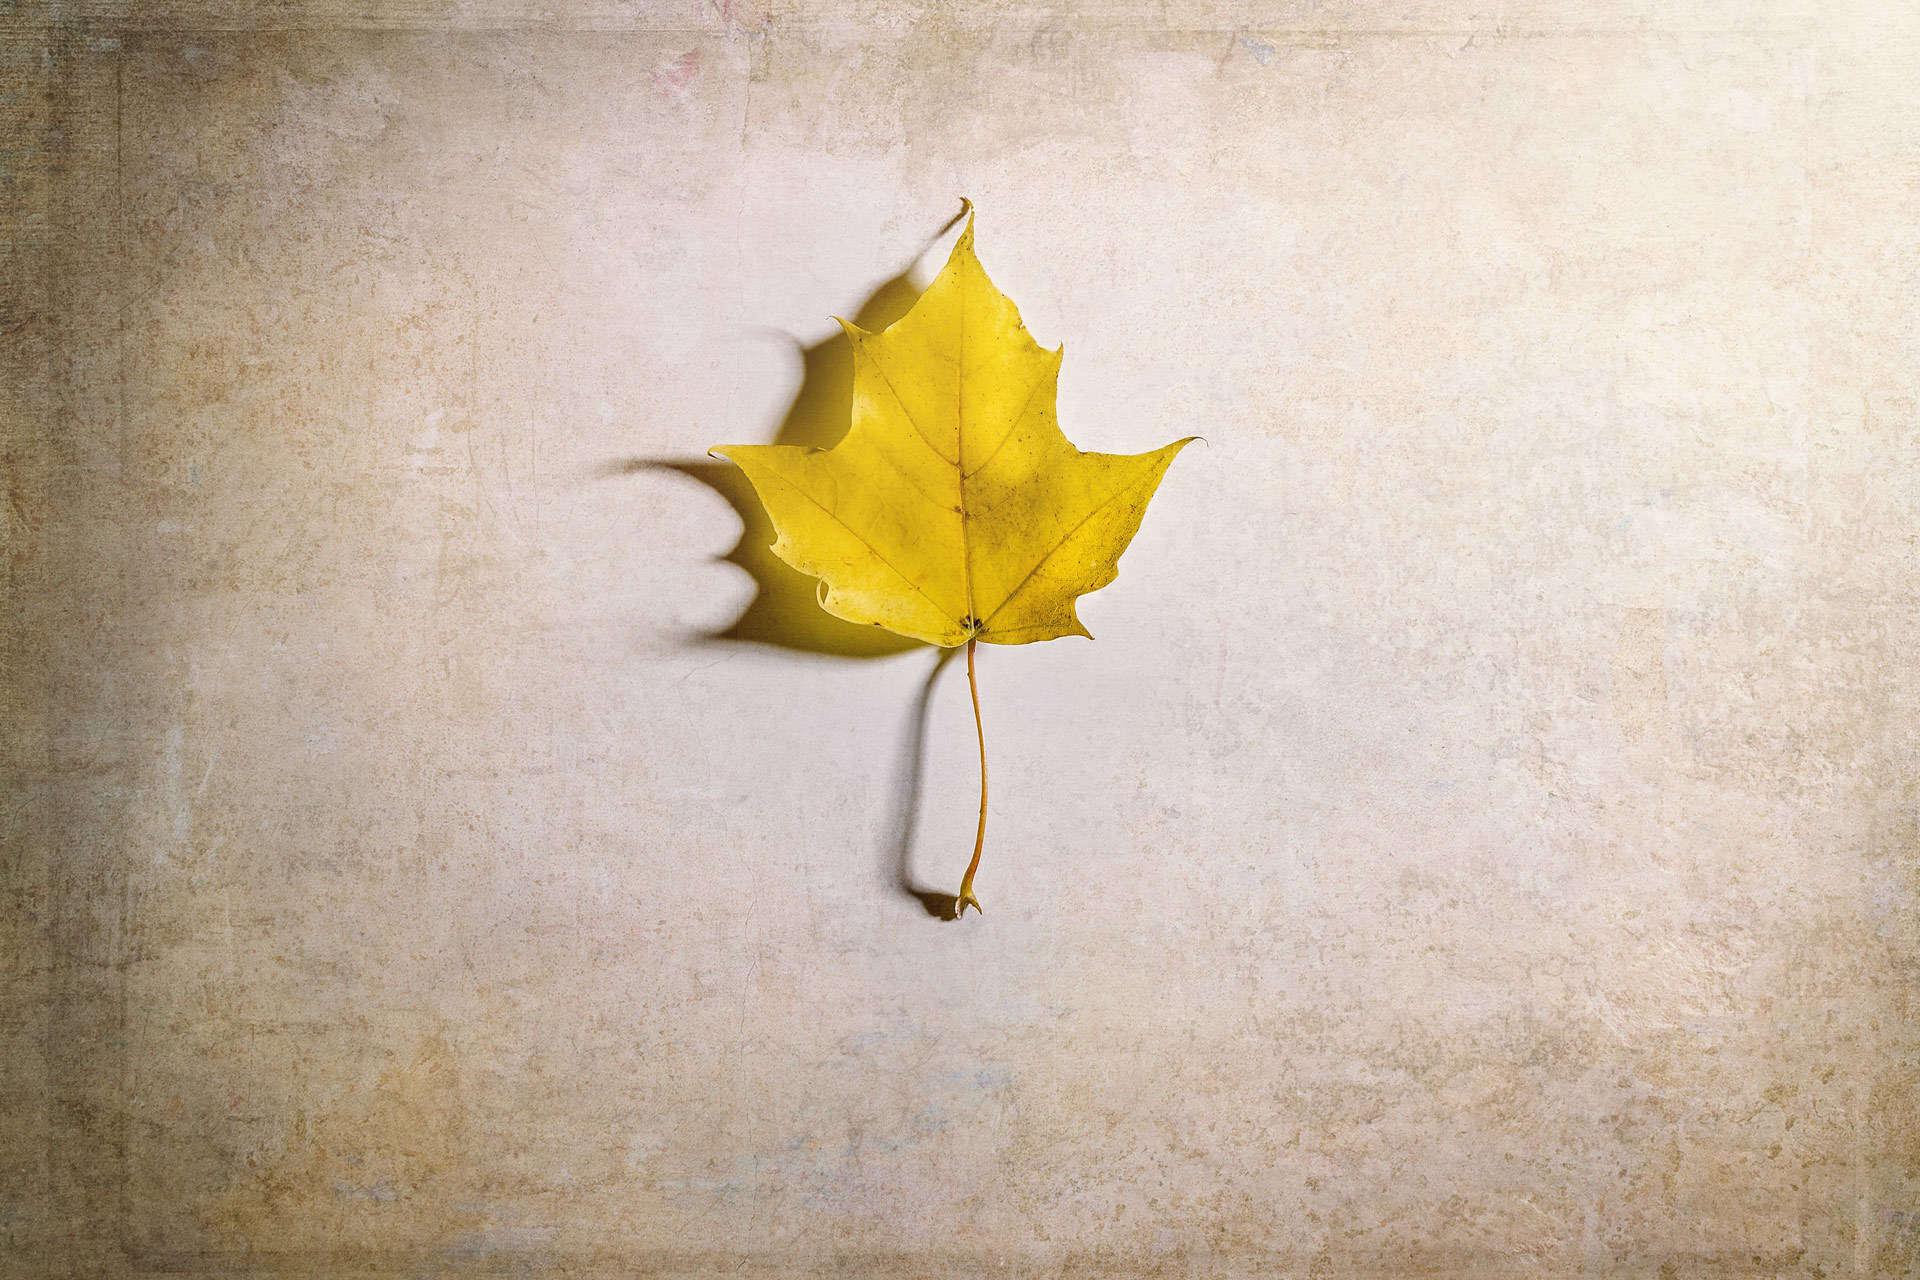 A Single Yellow Maple Leaf